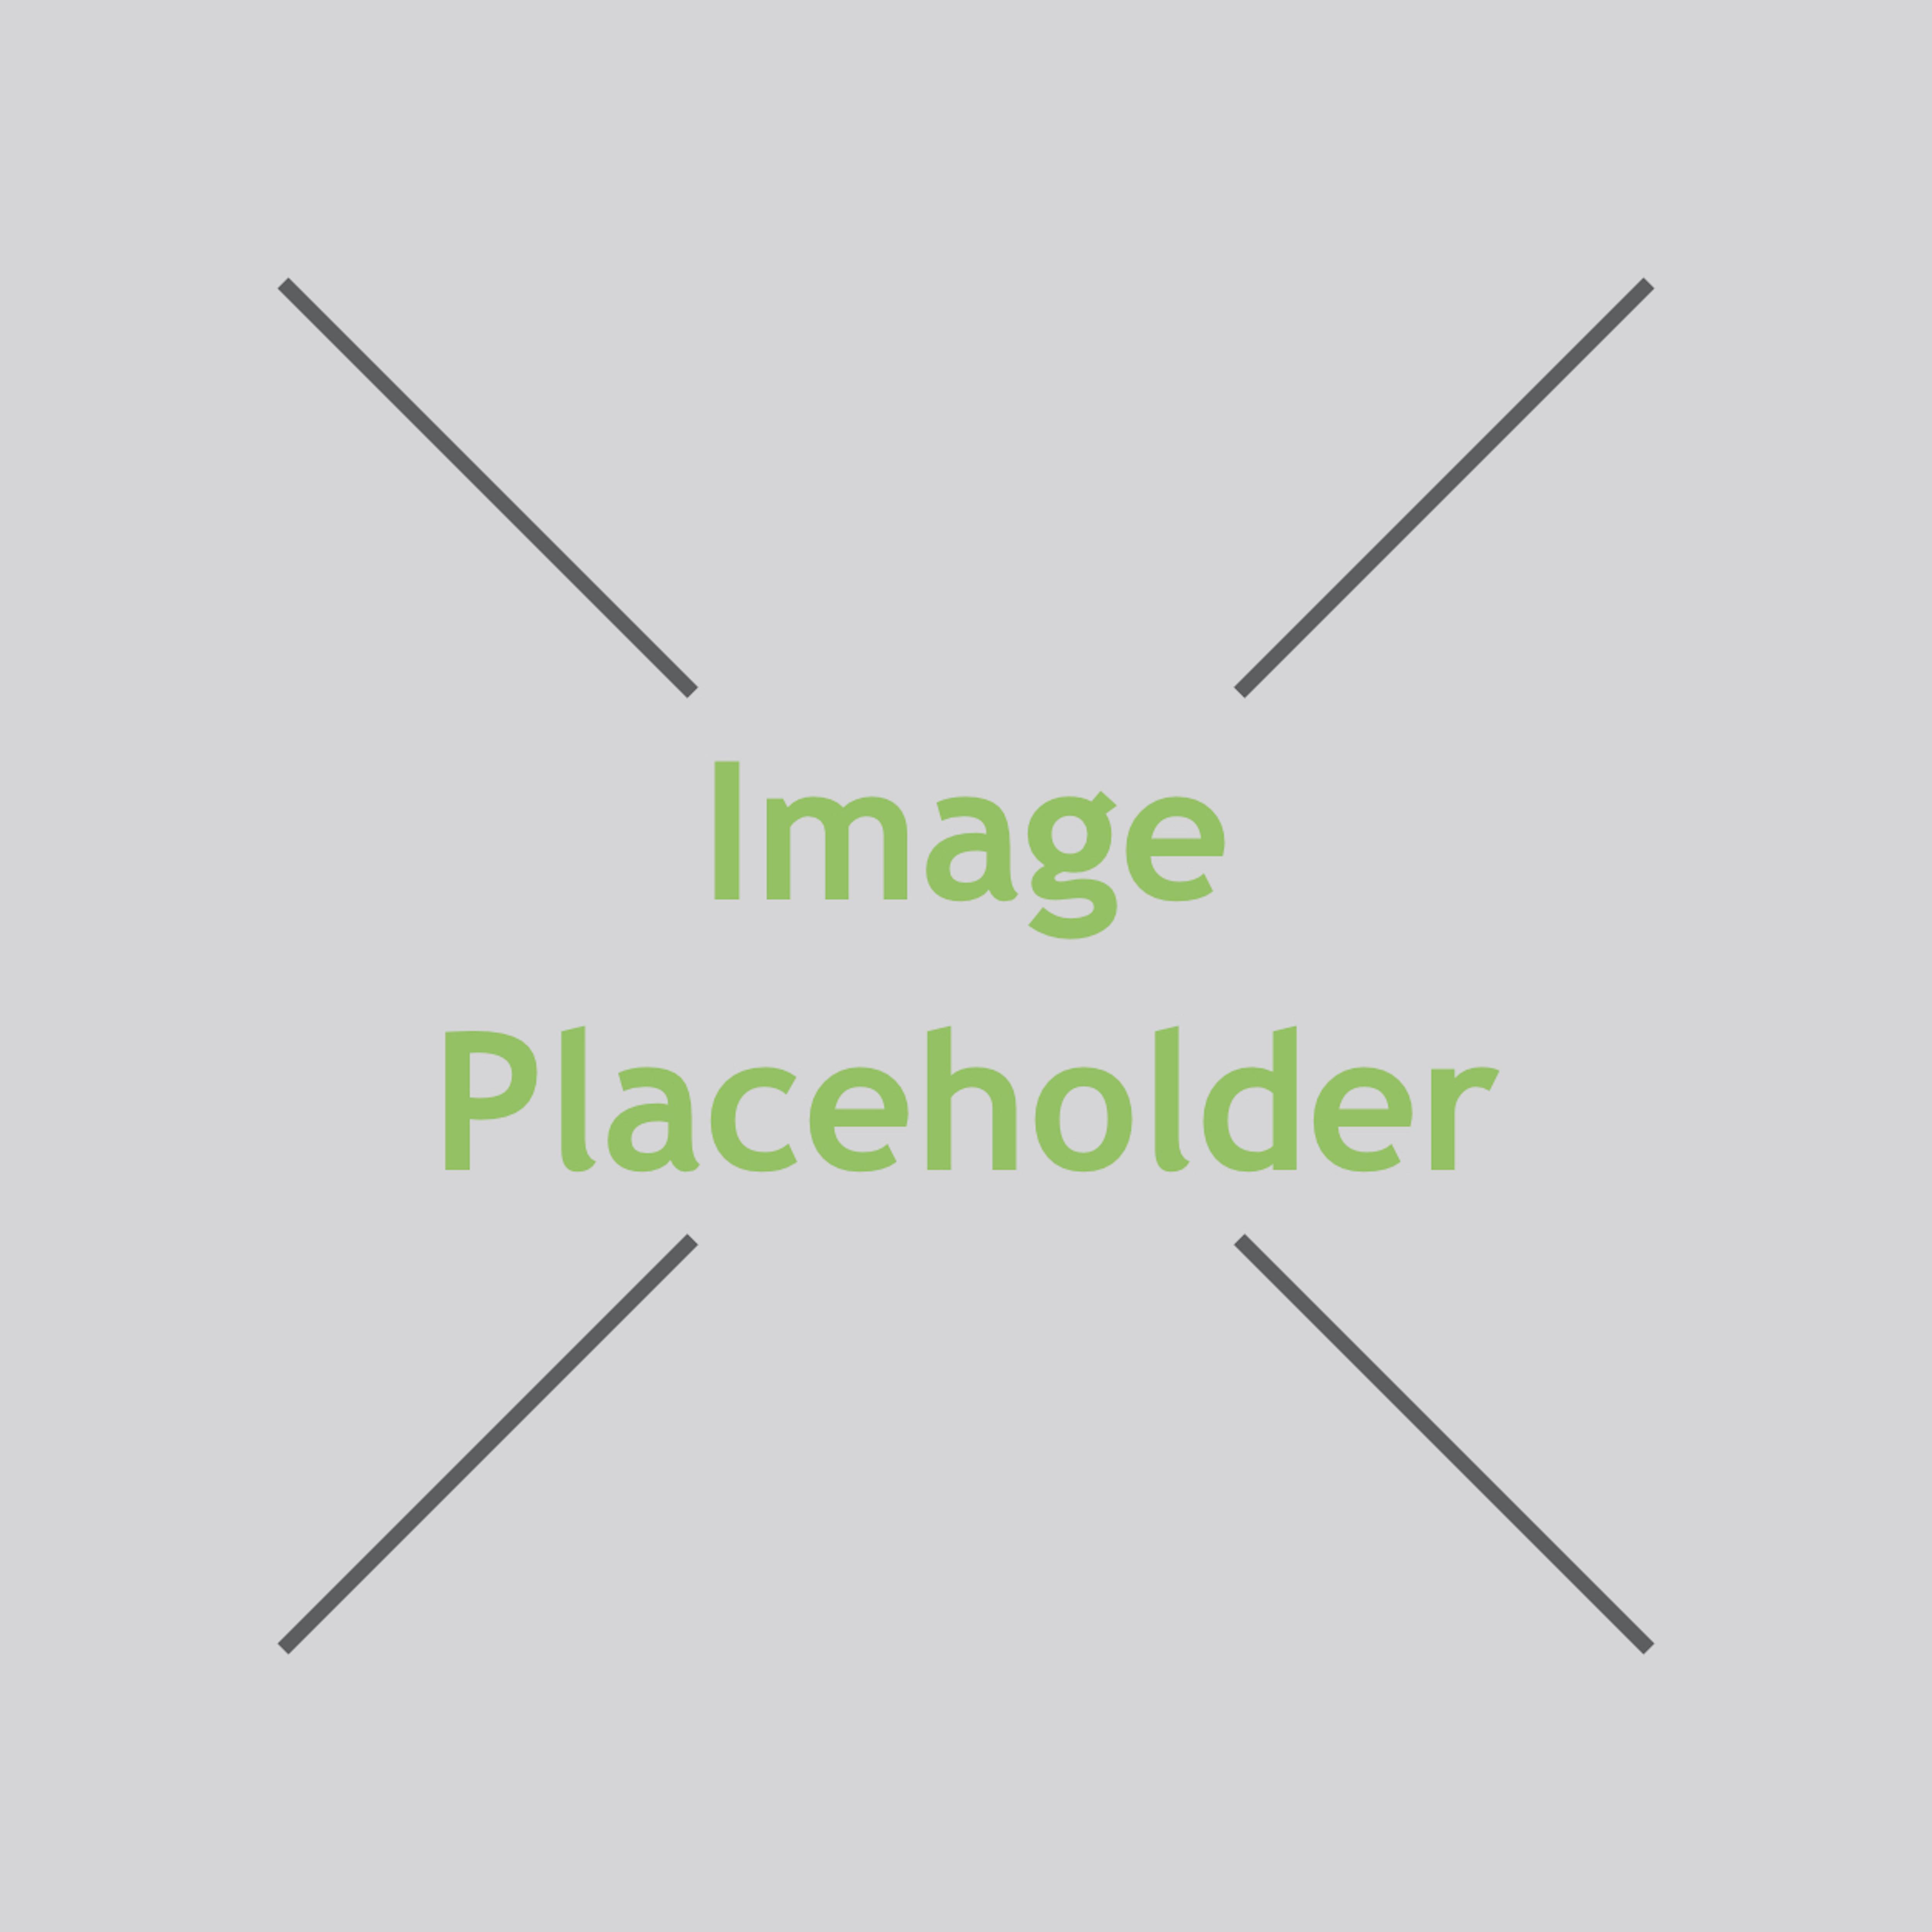 File:PLACEHOLDER.jpg